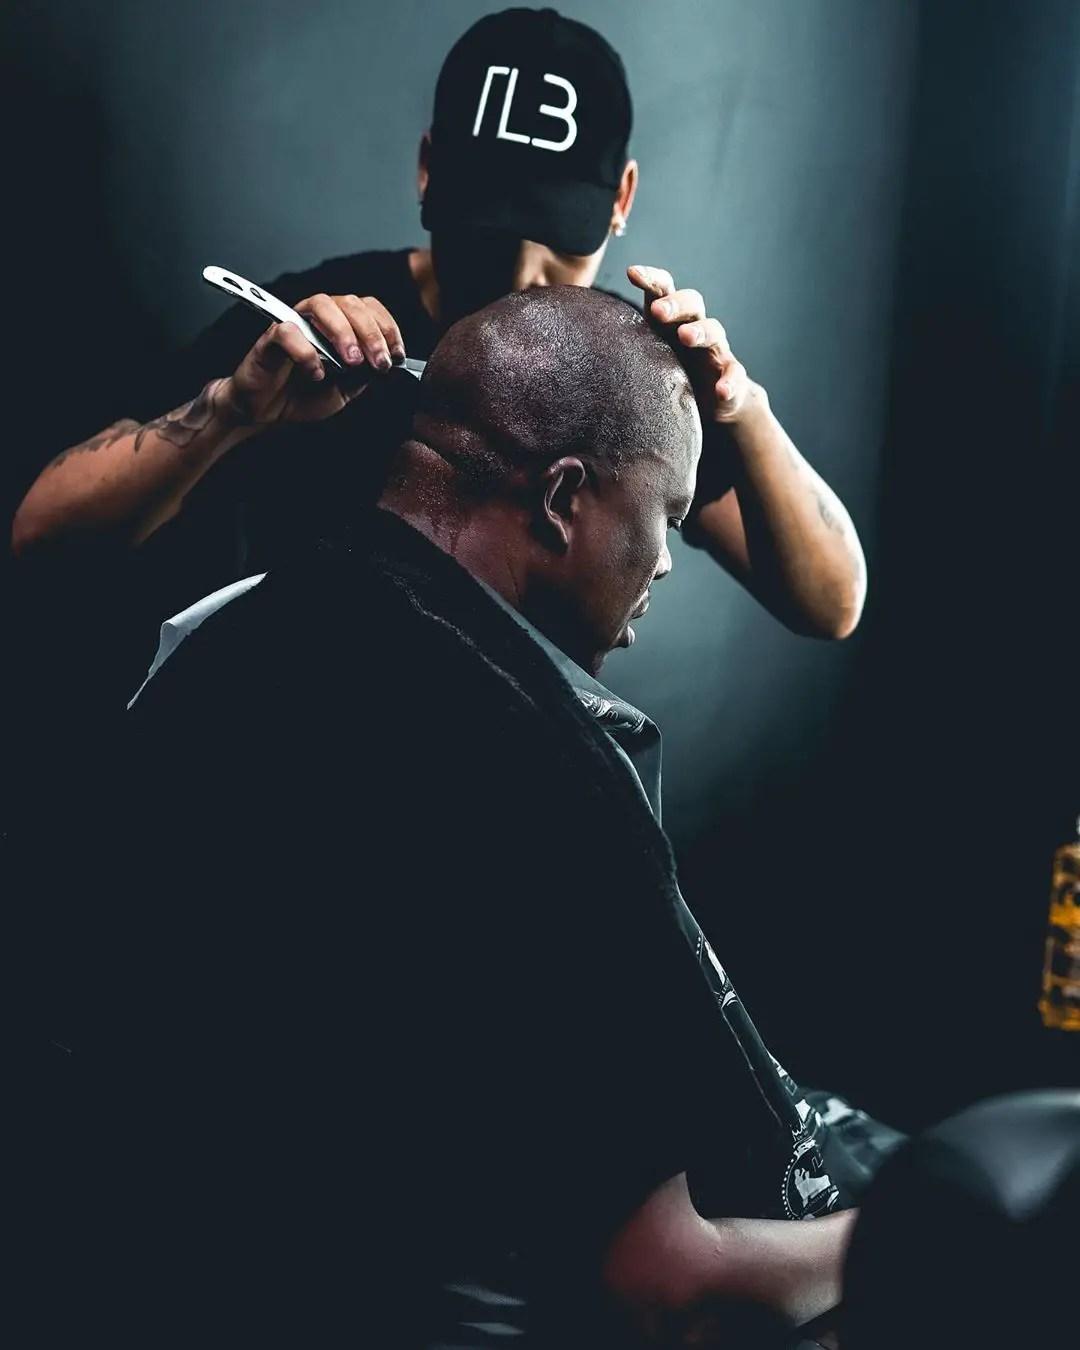 Mampintsha 1 - Babes Wodumo Strikes A New Hairstyle